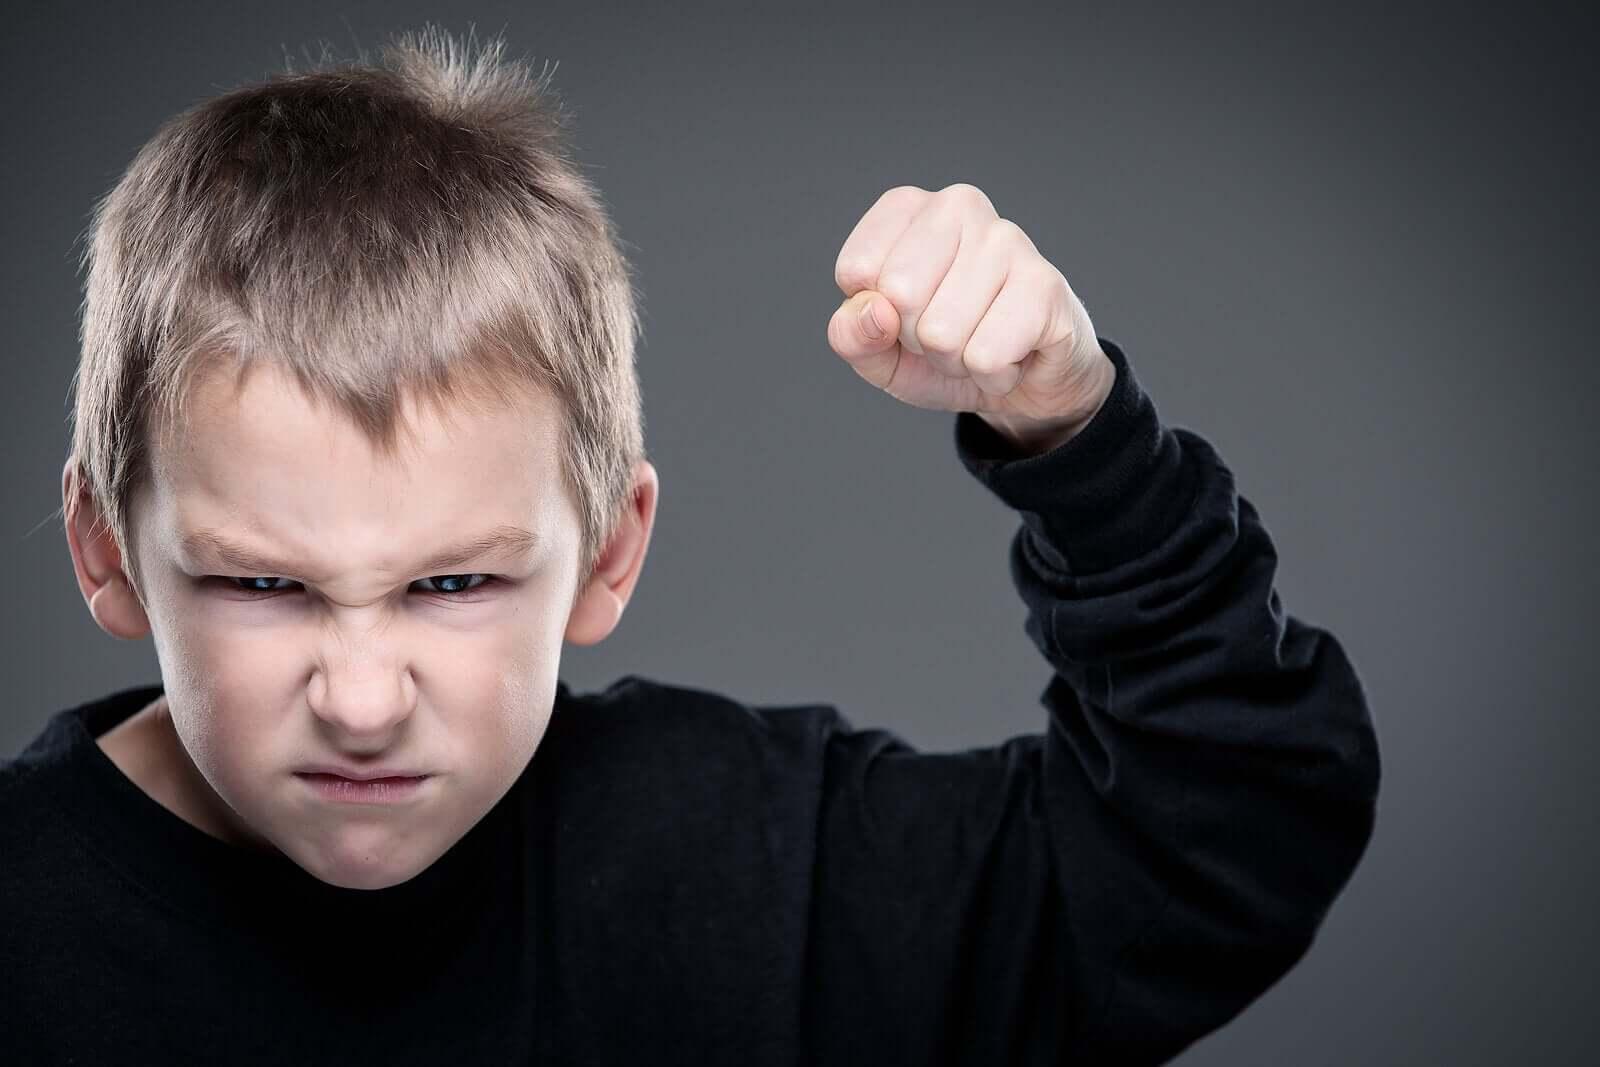 Miksi lapsi muuttuu aggressiiviseksi?